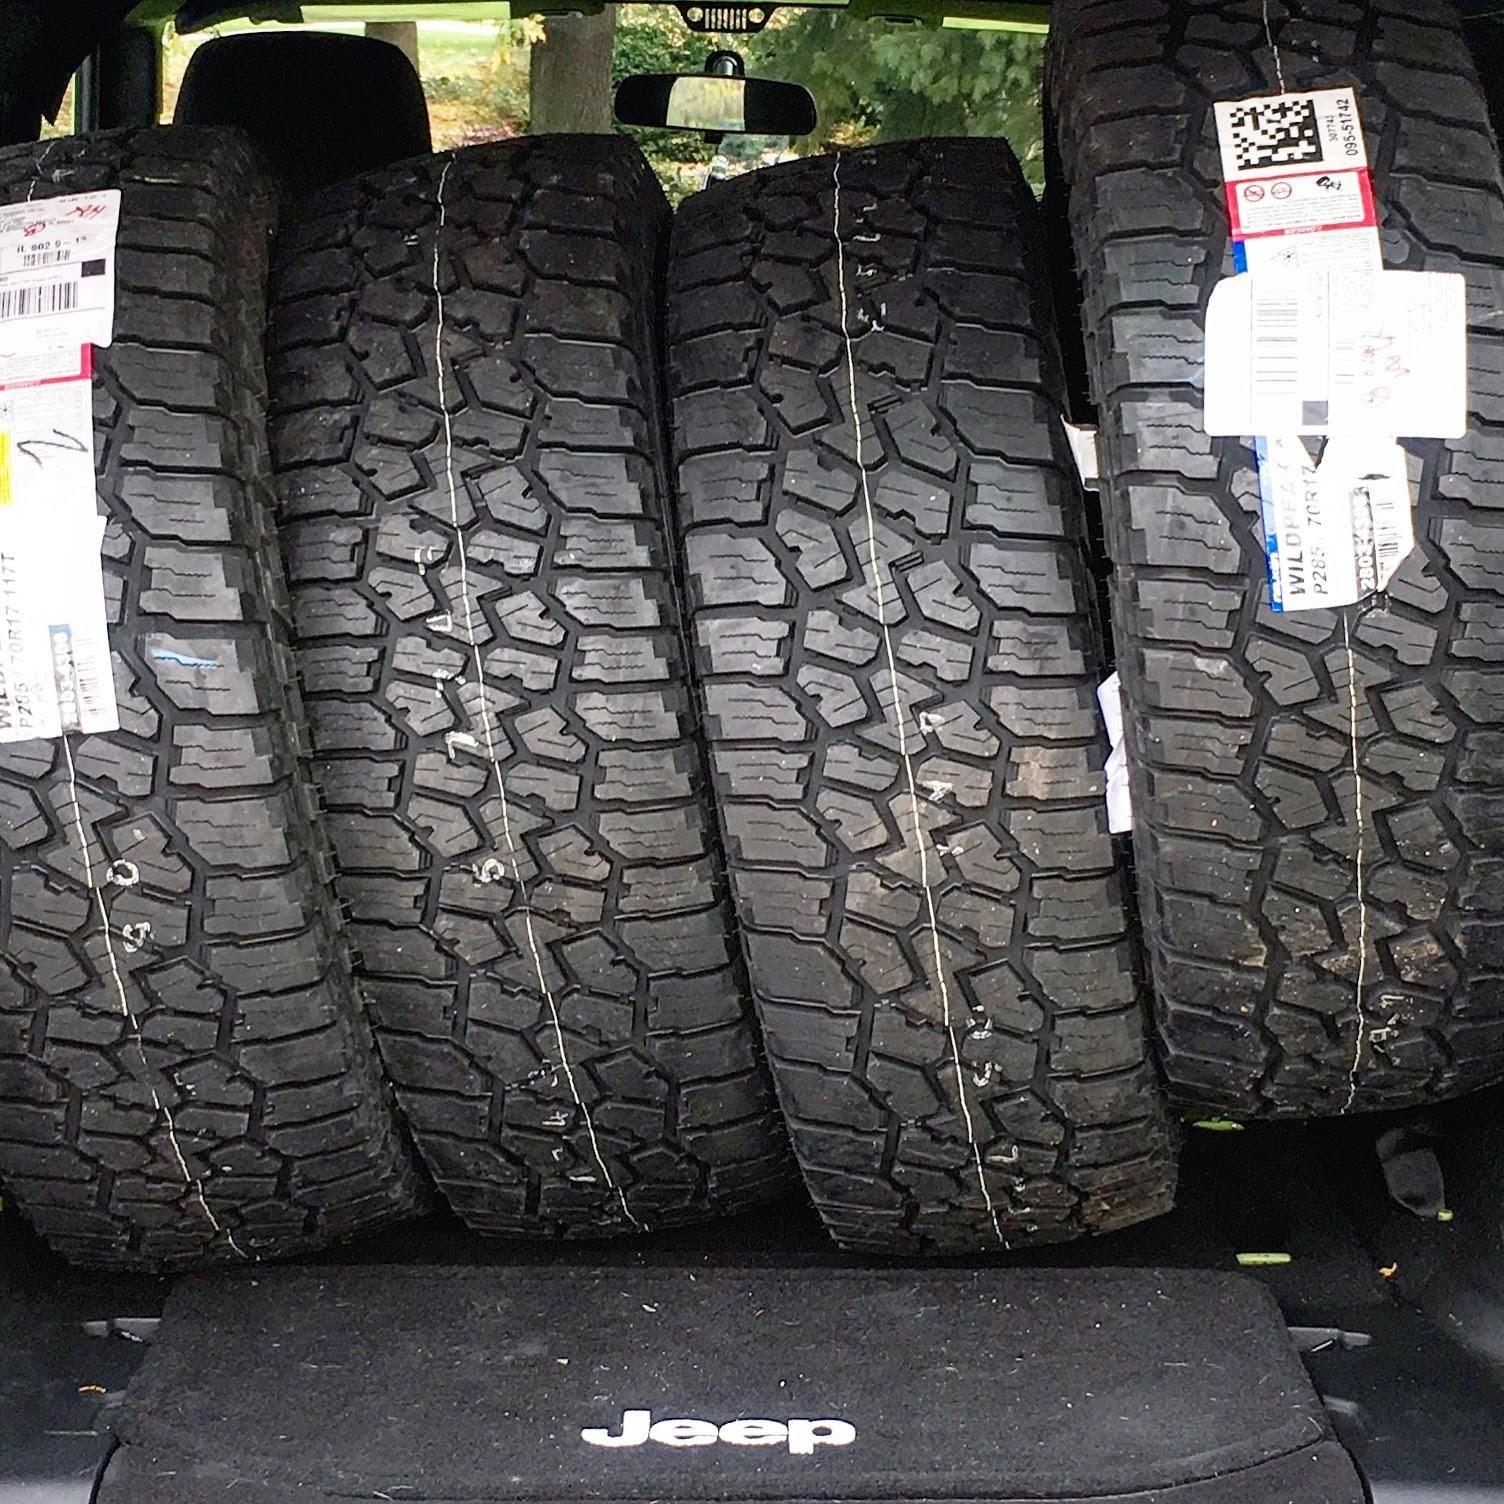 New tire day! 285/70r17 Falken Wildpeak AT3W jeep